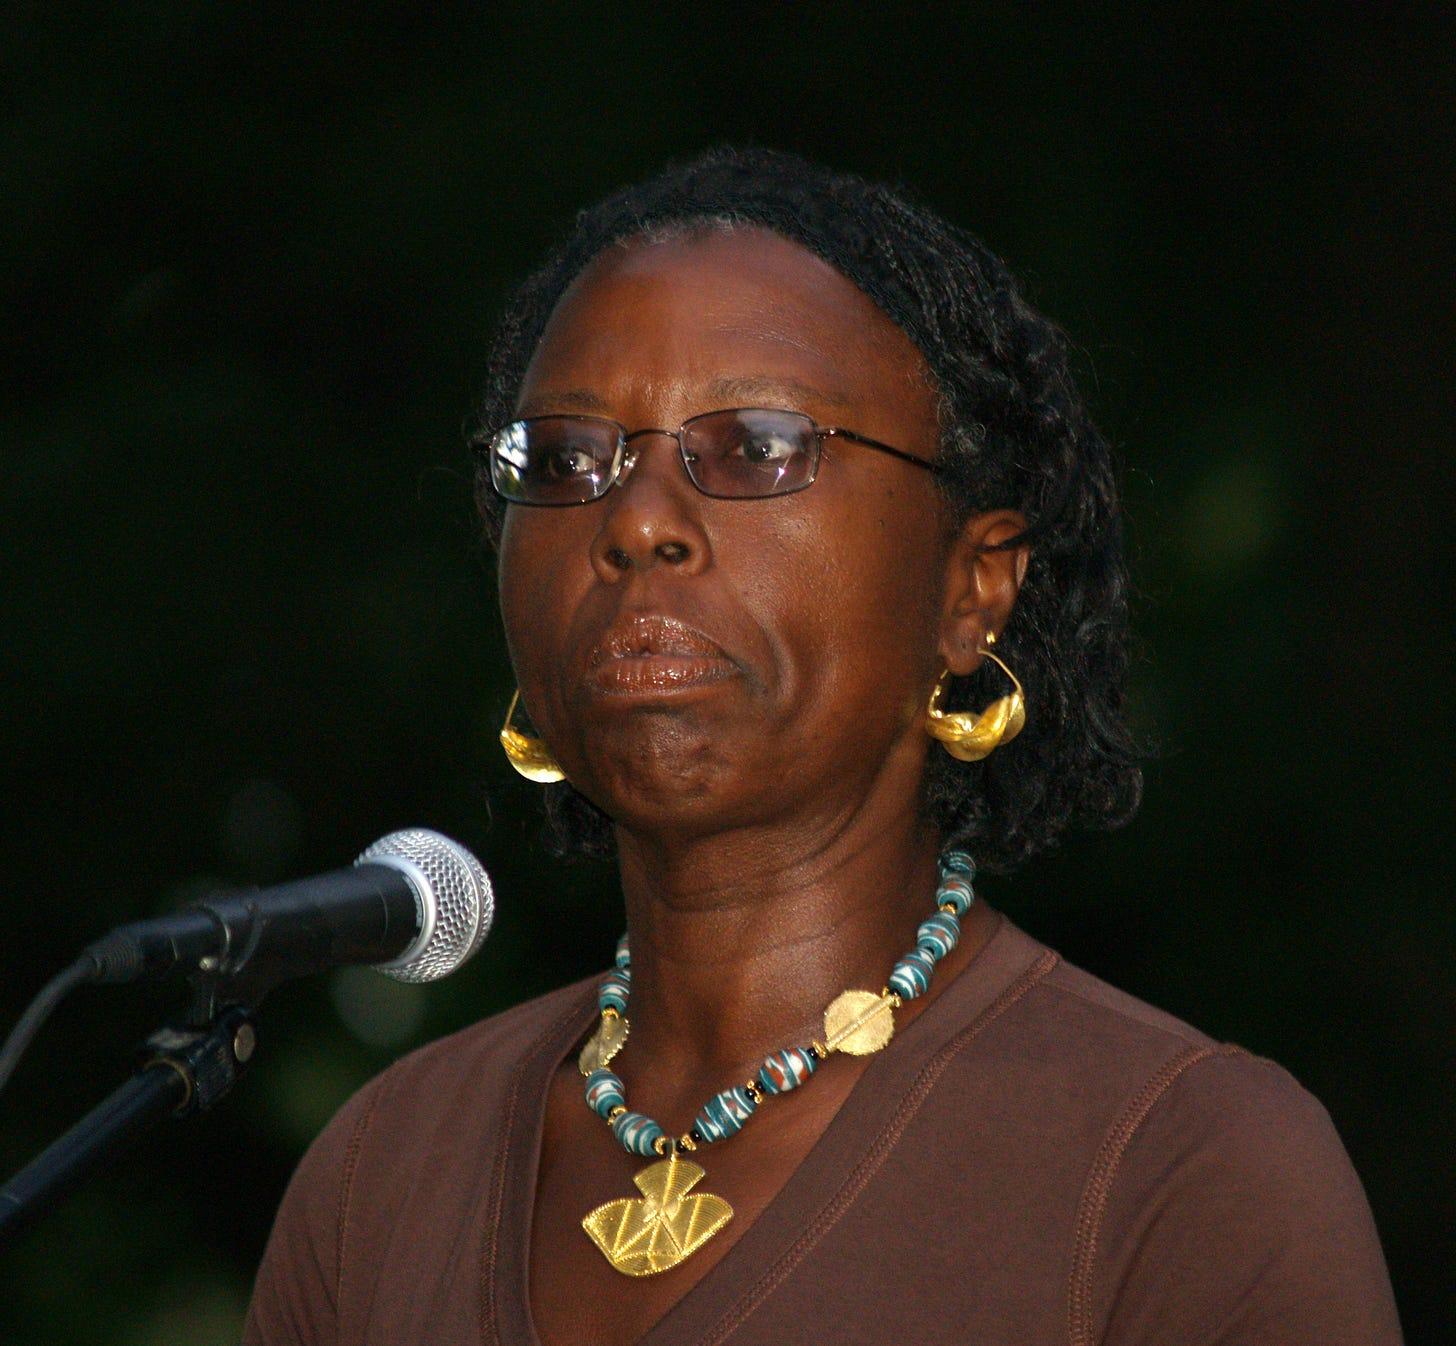 https://upload.wikimedia.org/wikipedia/commons/d/da/Gloria_Naylor_by_David_Shankbone.jpg